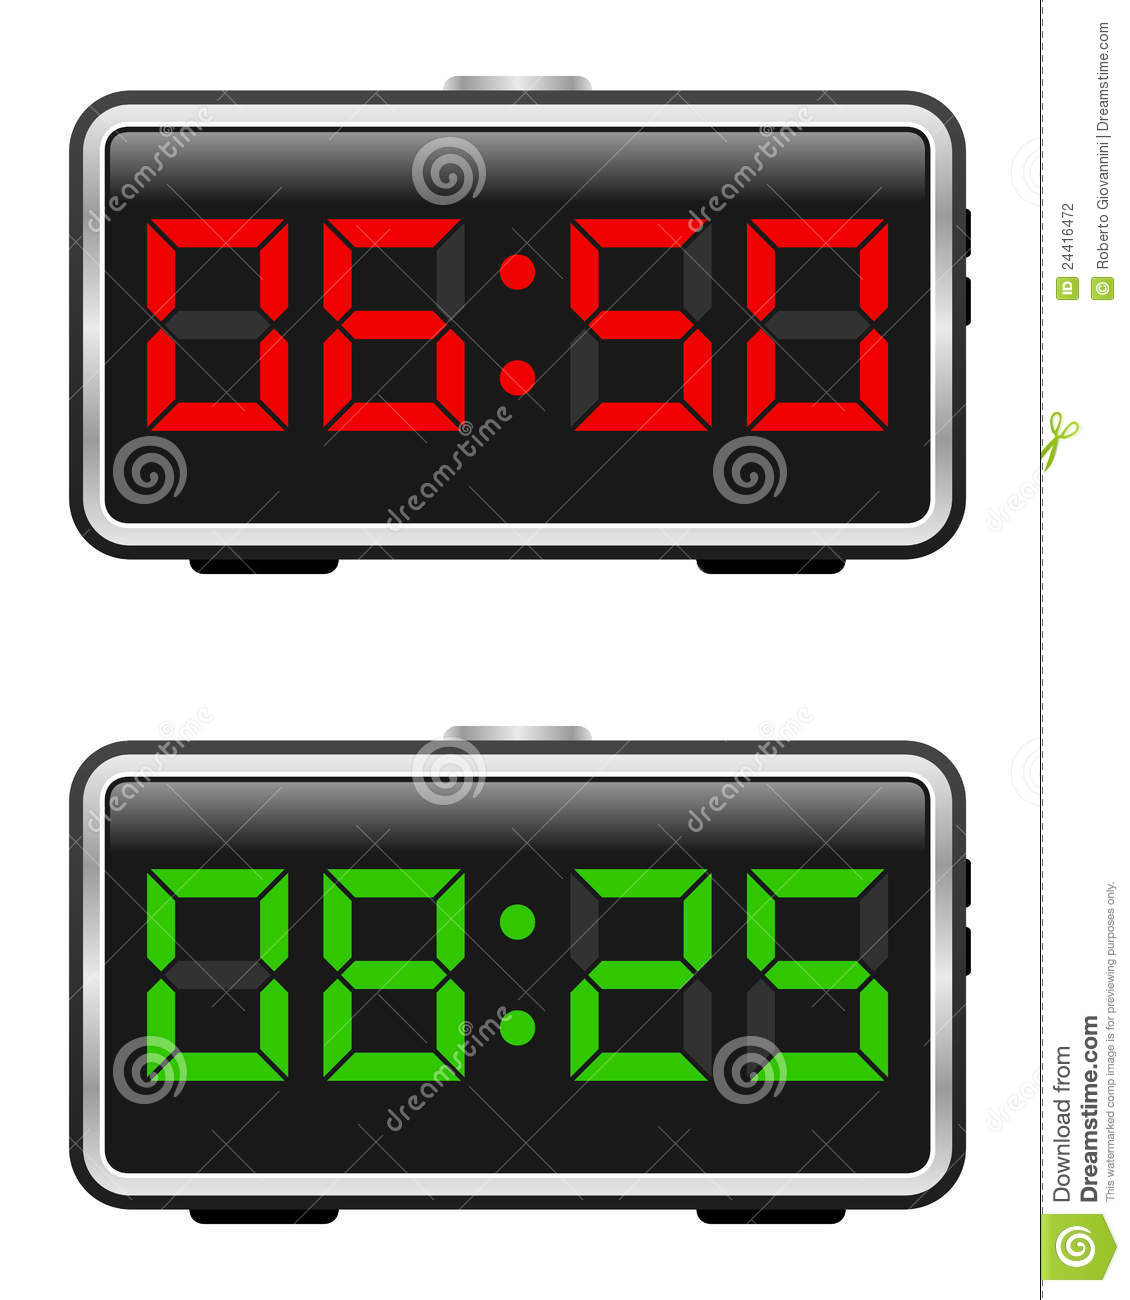 Digital alarm clock 6:30